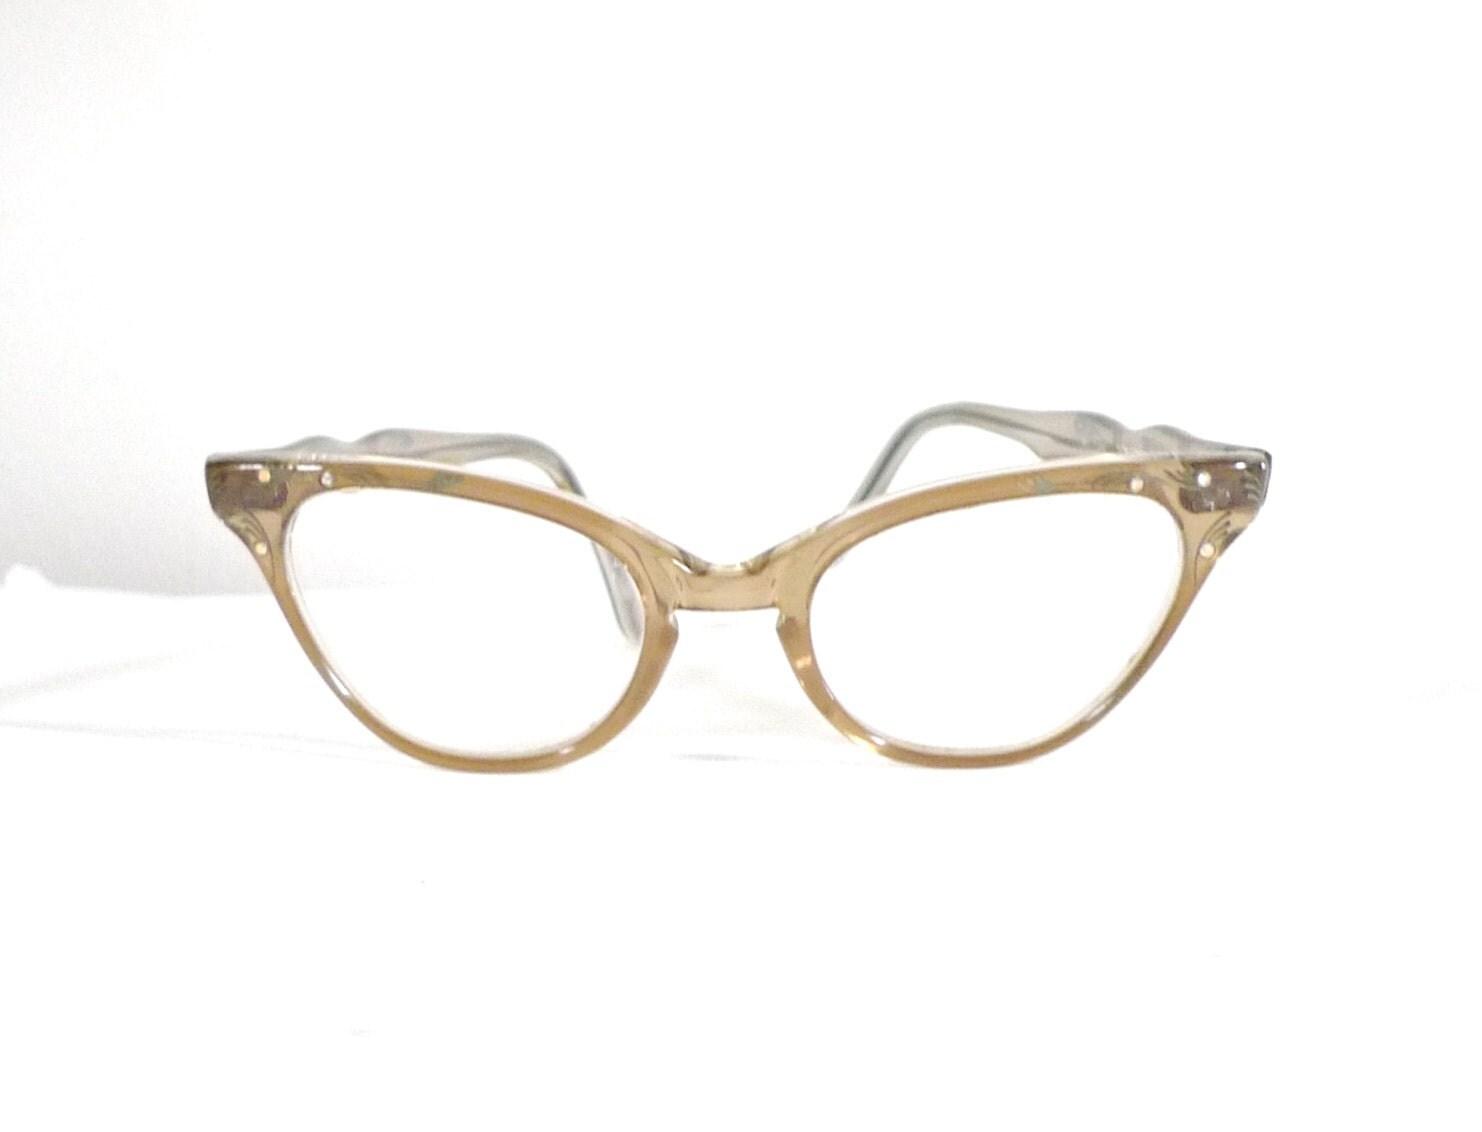 Cat Eye Rhinestone Eyeglass Frames : Rhinestone Frame France Cat Eye Glasses / TWEC / by ...